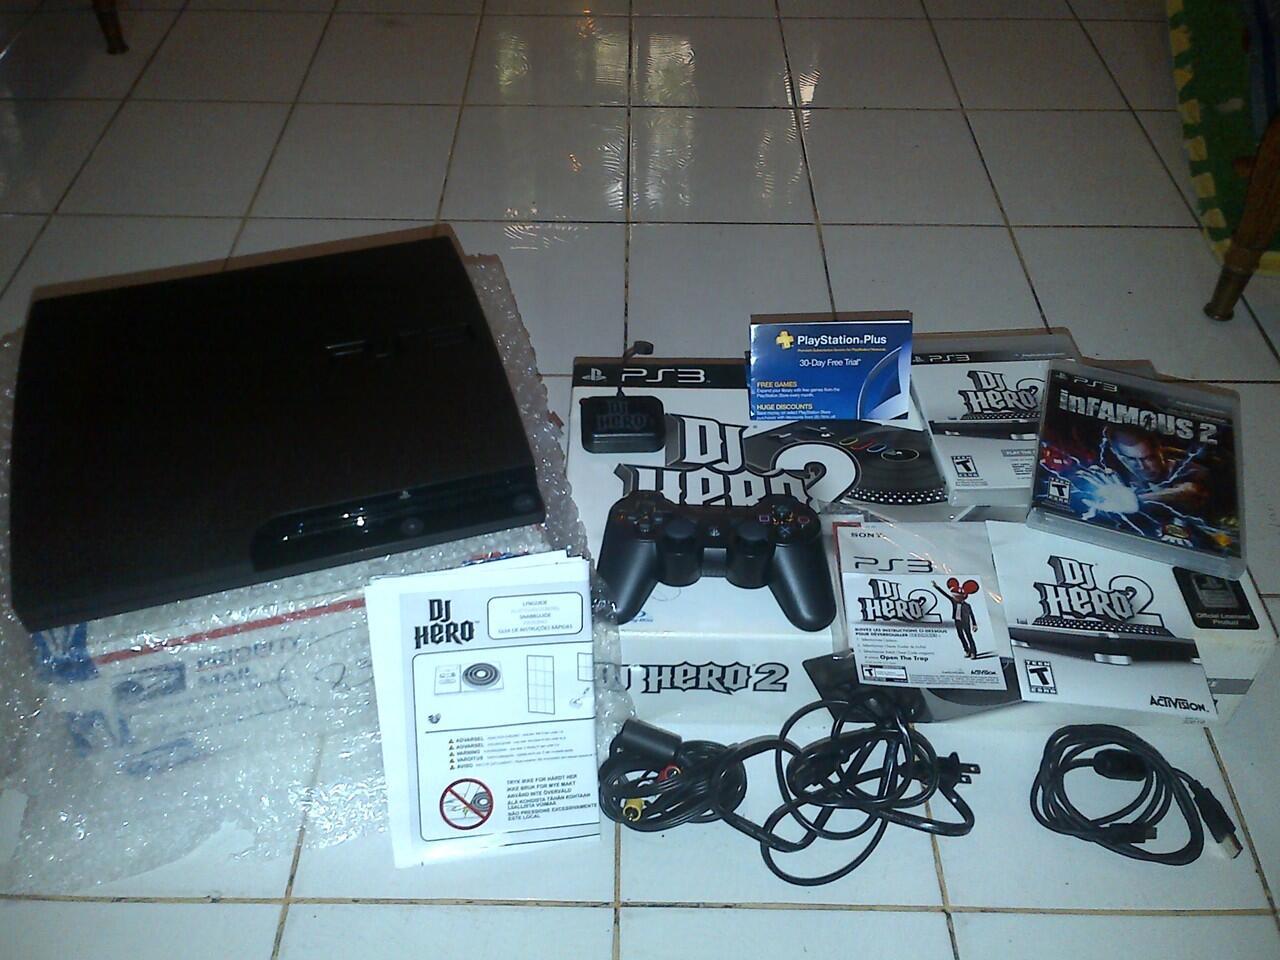 WTS PS3 Slim 320GB Original